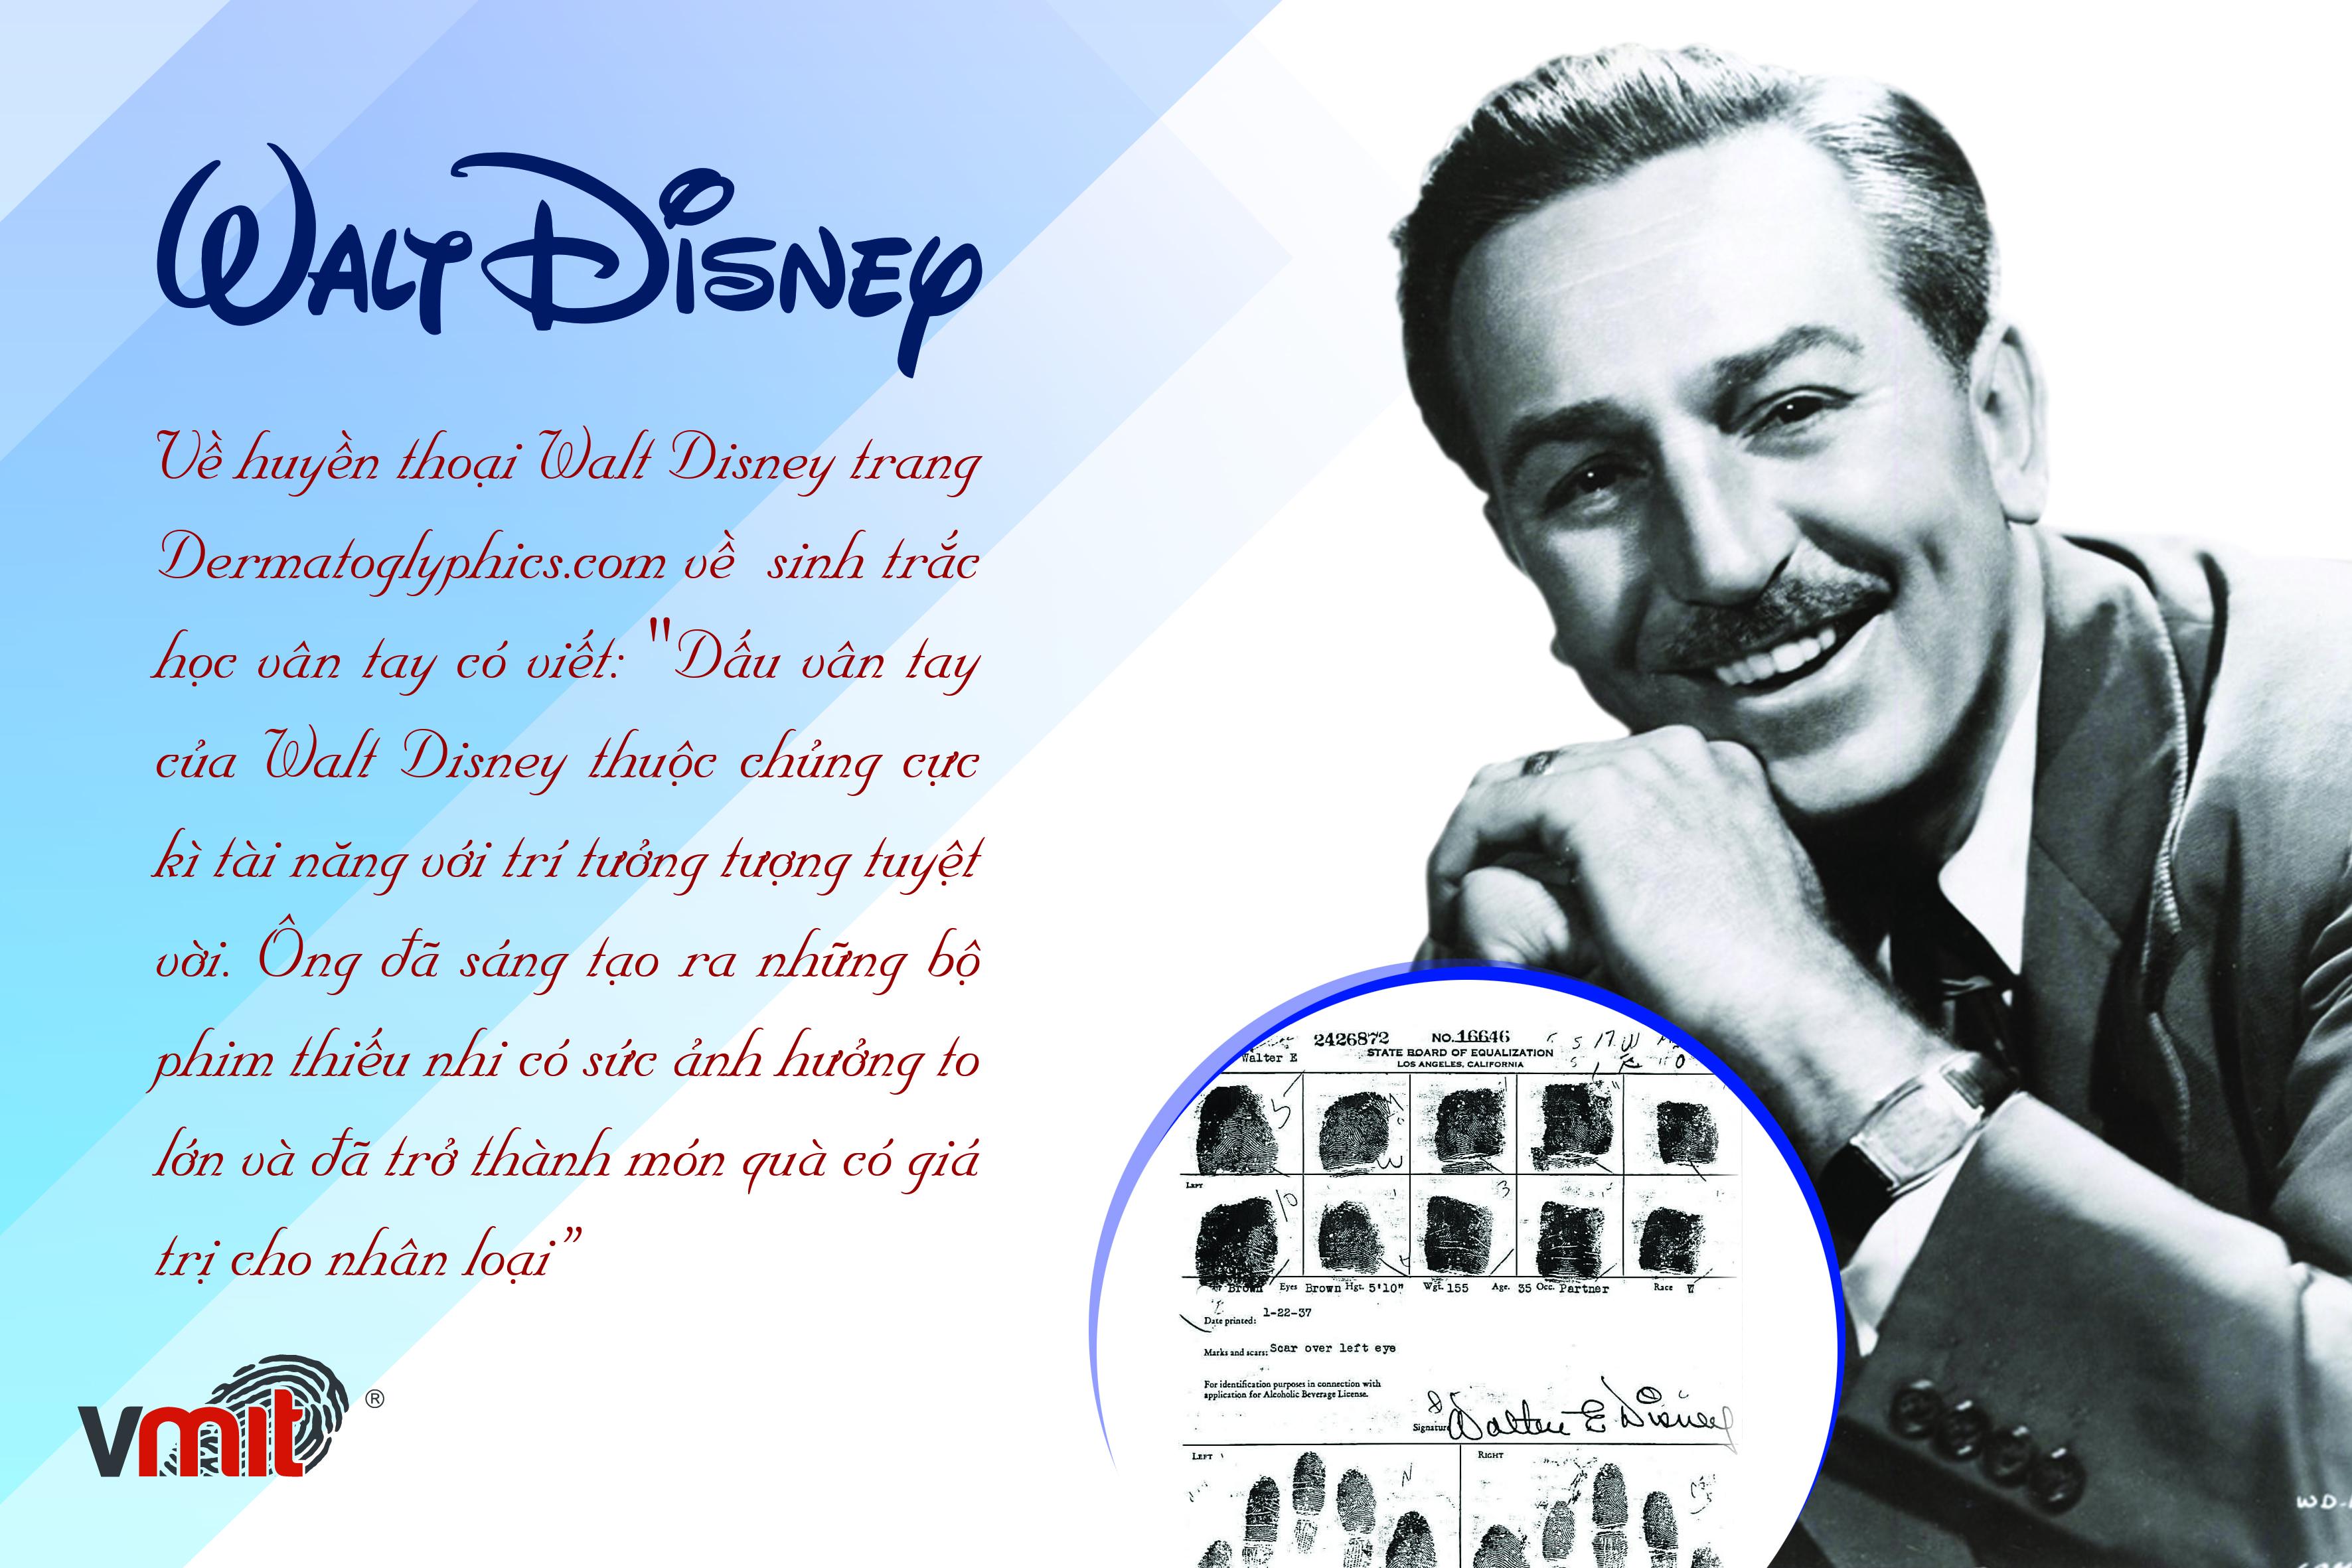 Vân tay của thiên tài Waltd Disney